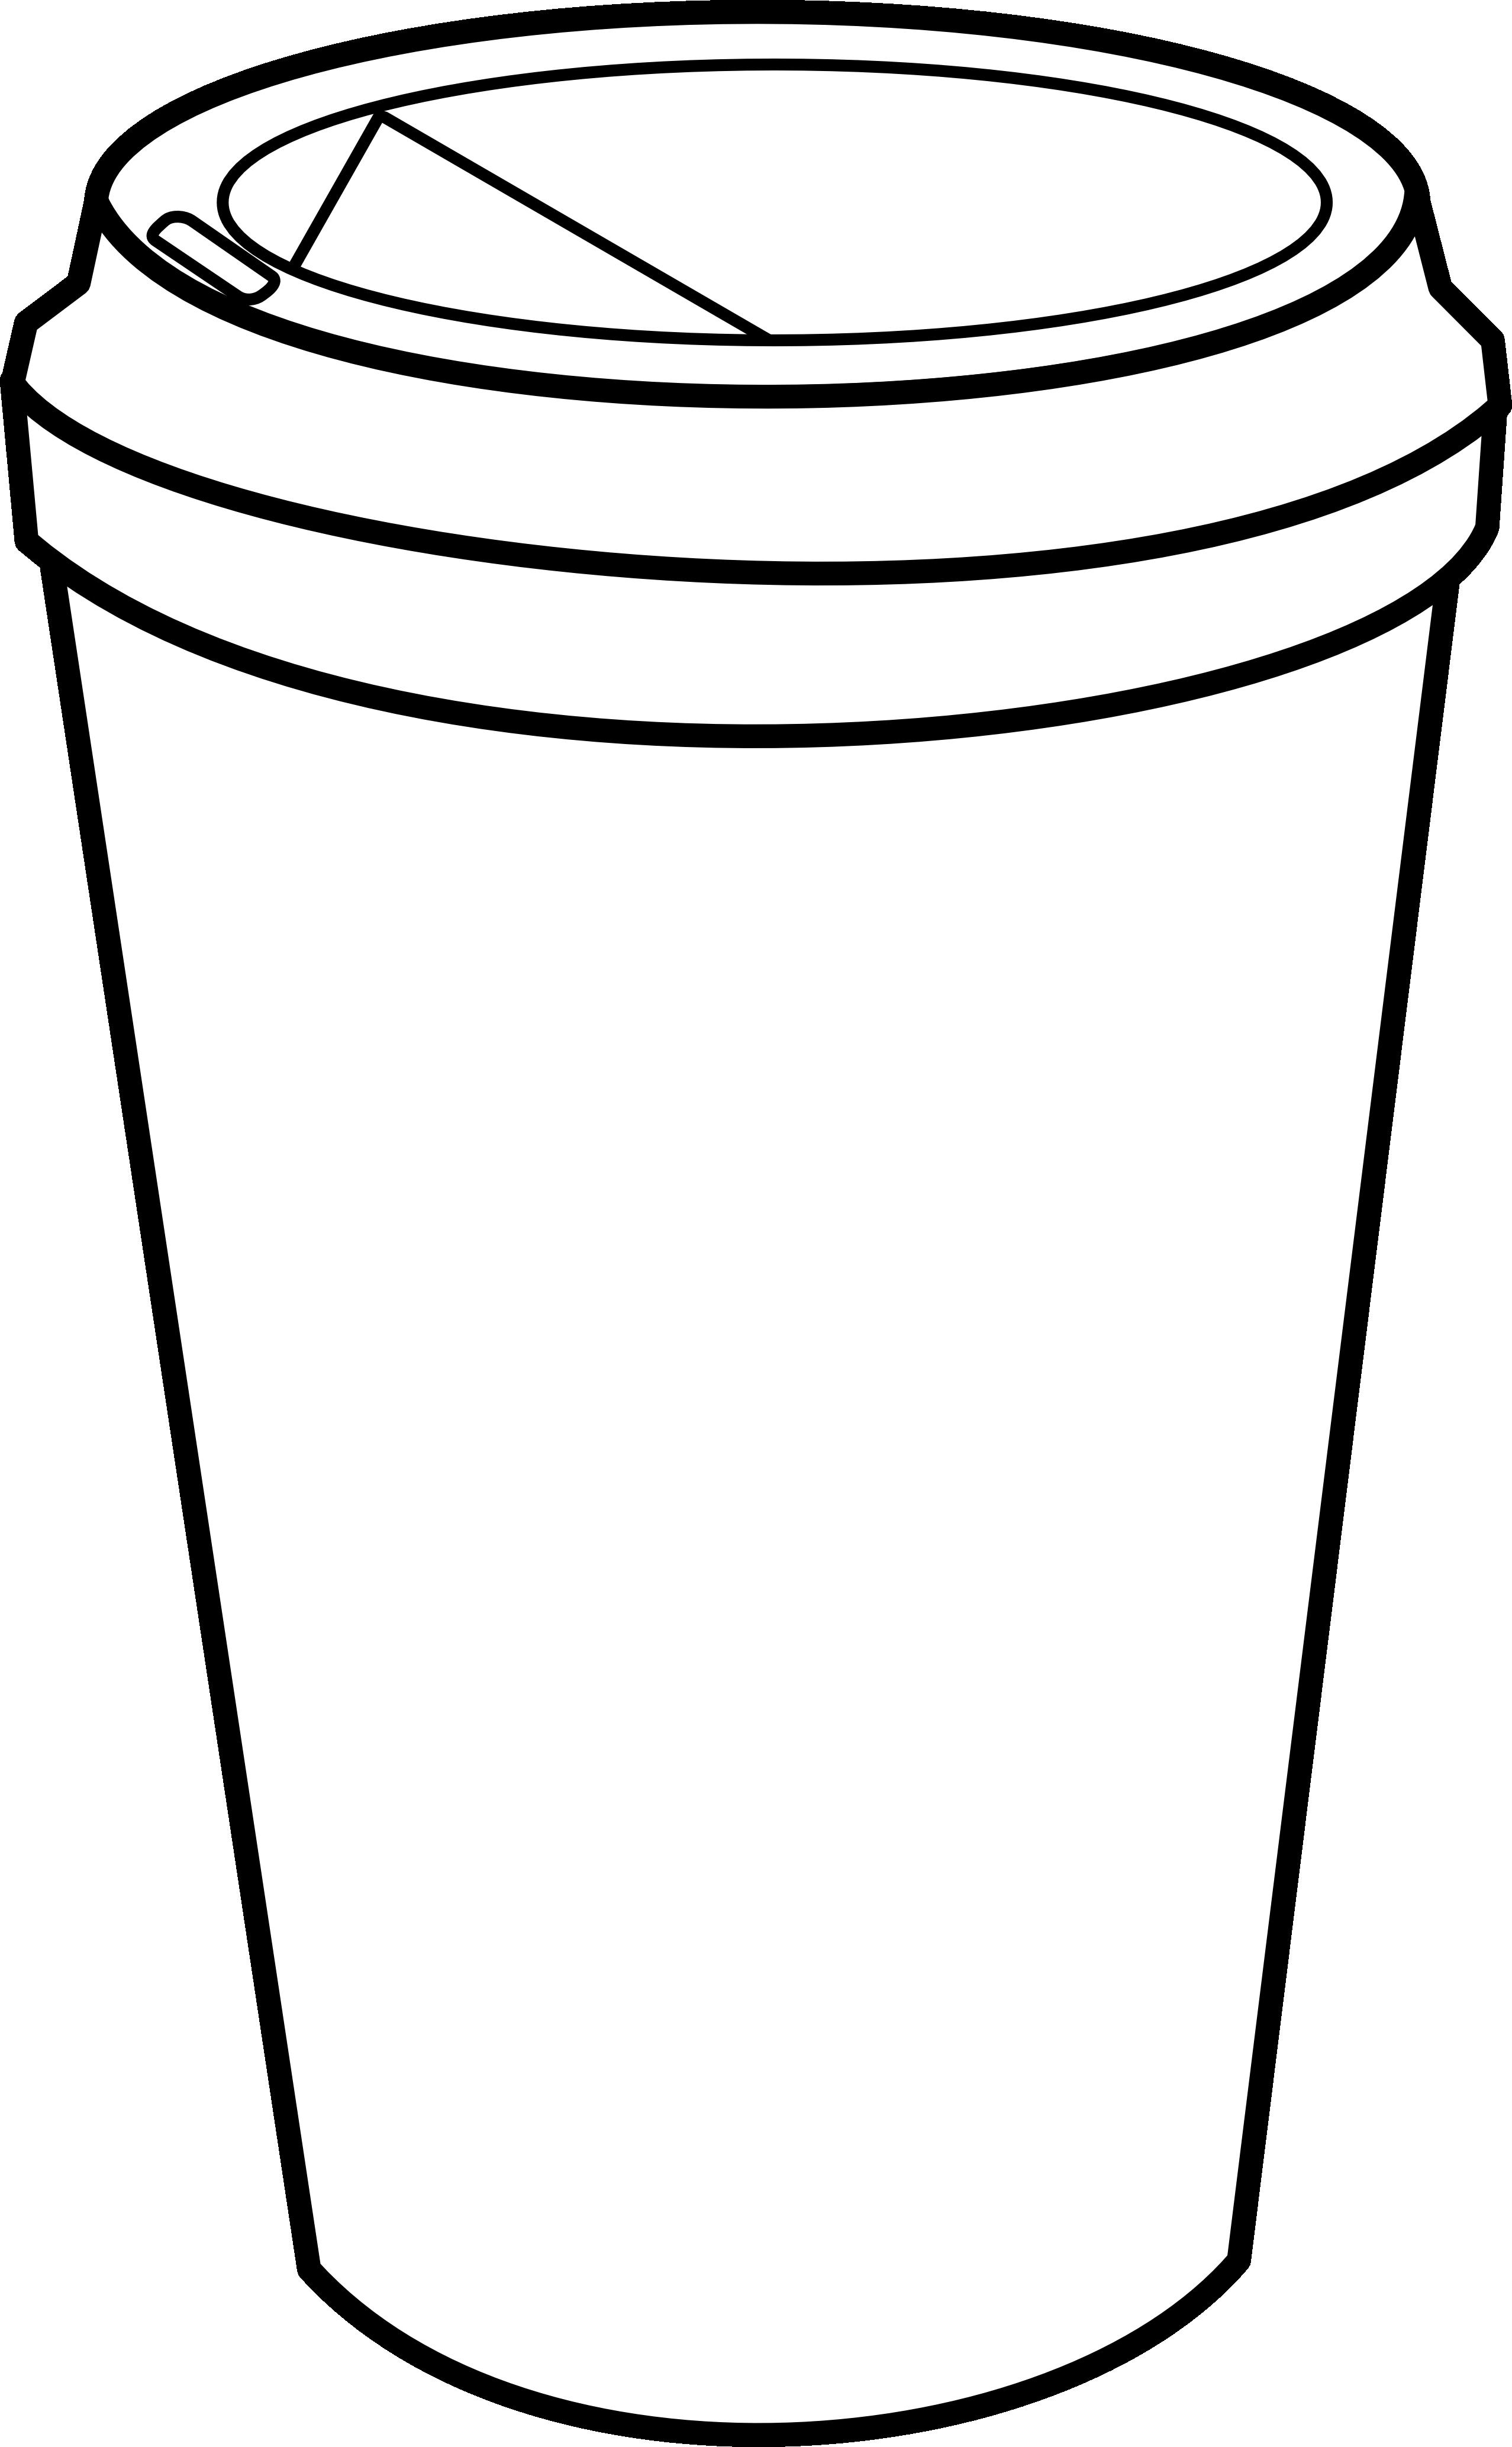 Free Black And White Starbucks Logo, Download Free Clip Art.